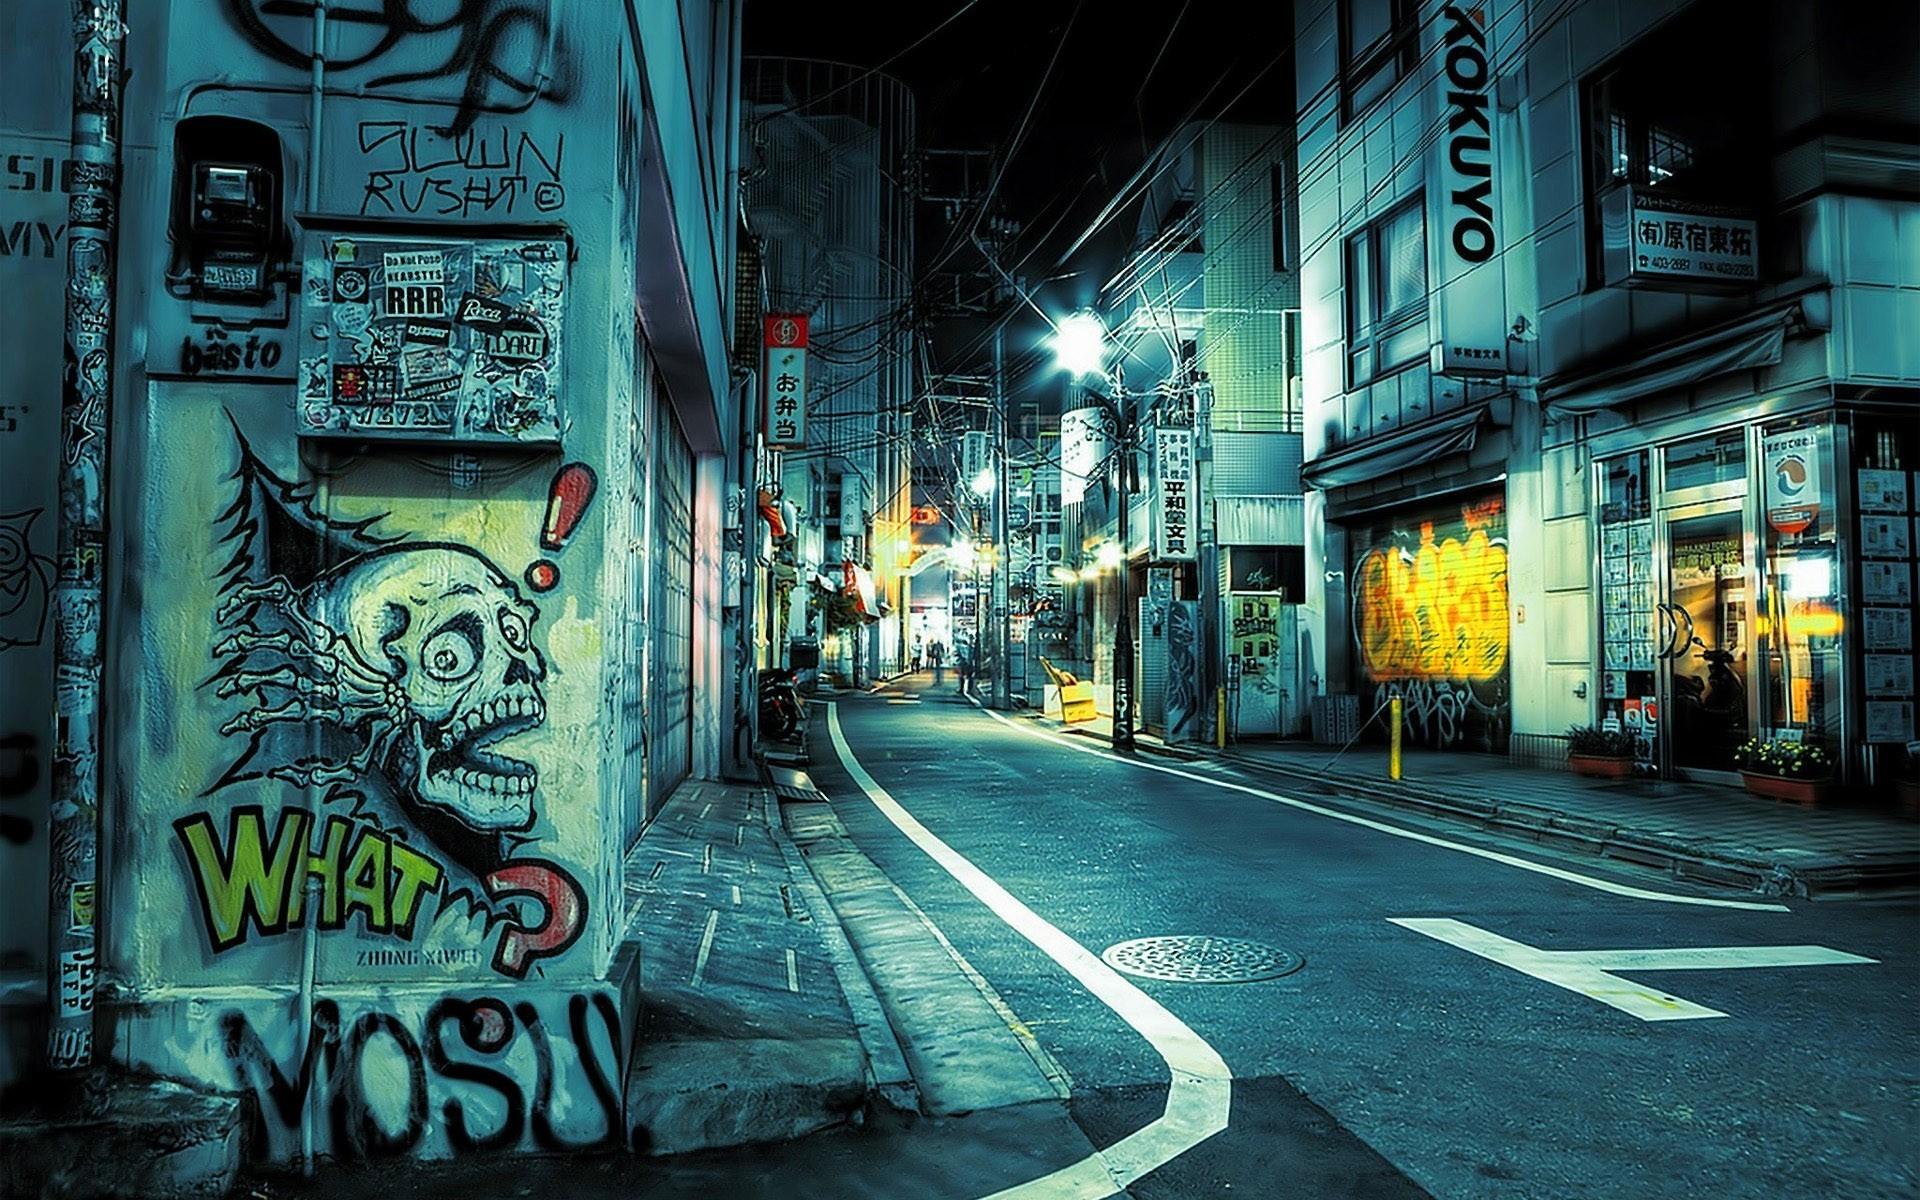 Japan Tokyo Street Night Desktop Wallpaper.jpg (1920×1200)   Tokyo    Pinterest   Tokyo streets, Tokyo night and Tokyo